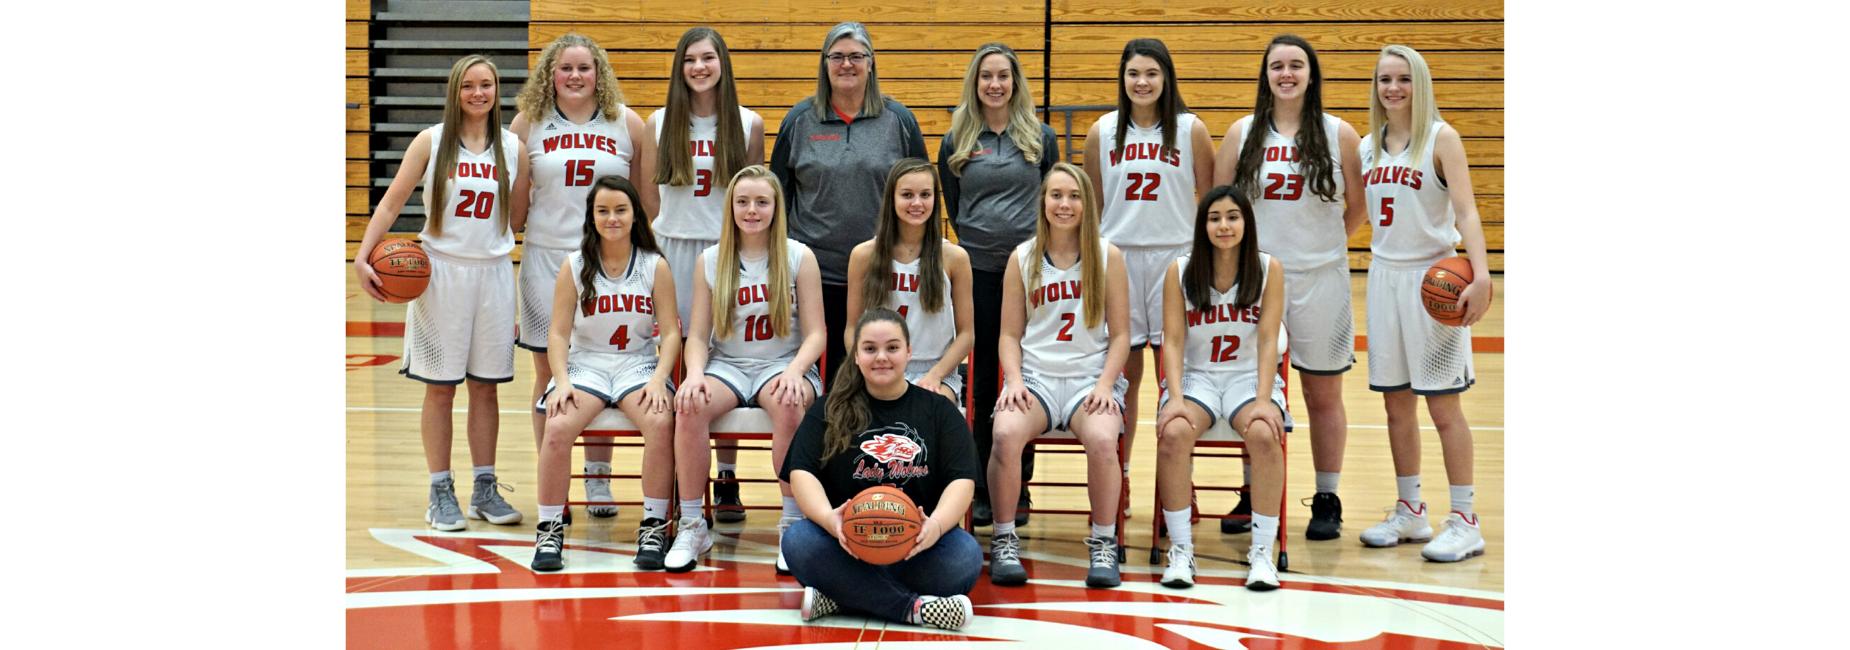 RSHS Girls Basketball Team